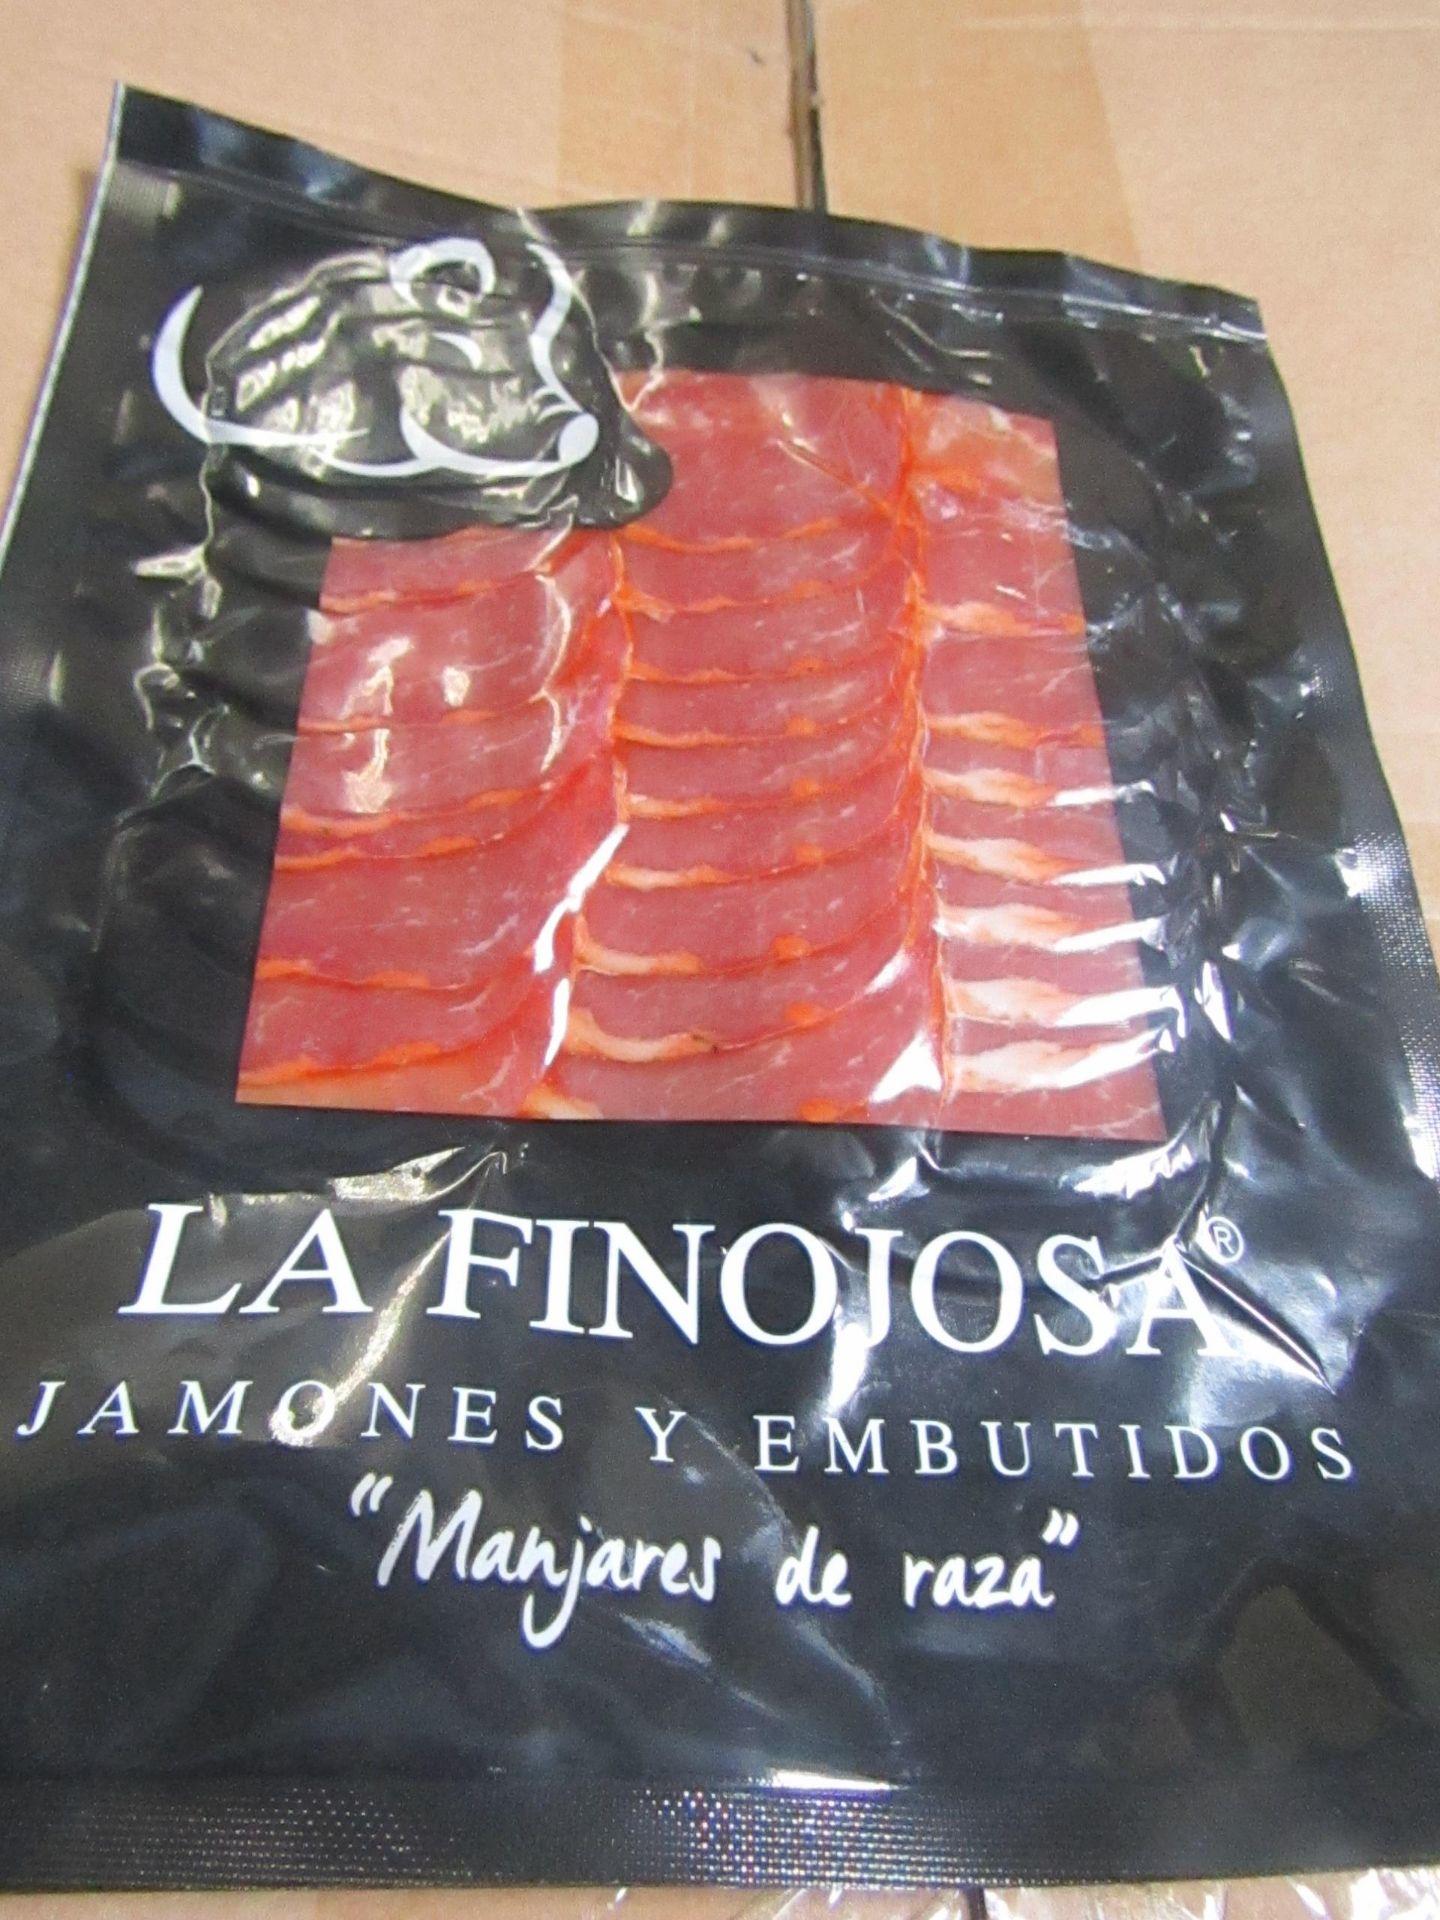 5 x La Finojosa 100g Packets Hand Carved Iberico Ham BB 7.3.22 RRP £24.50 per packet on Amazon